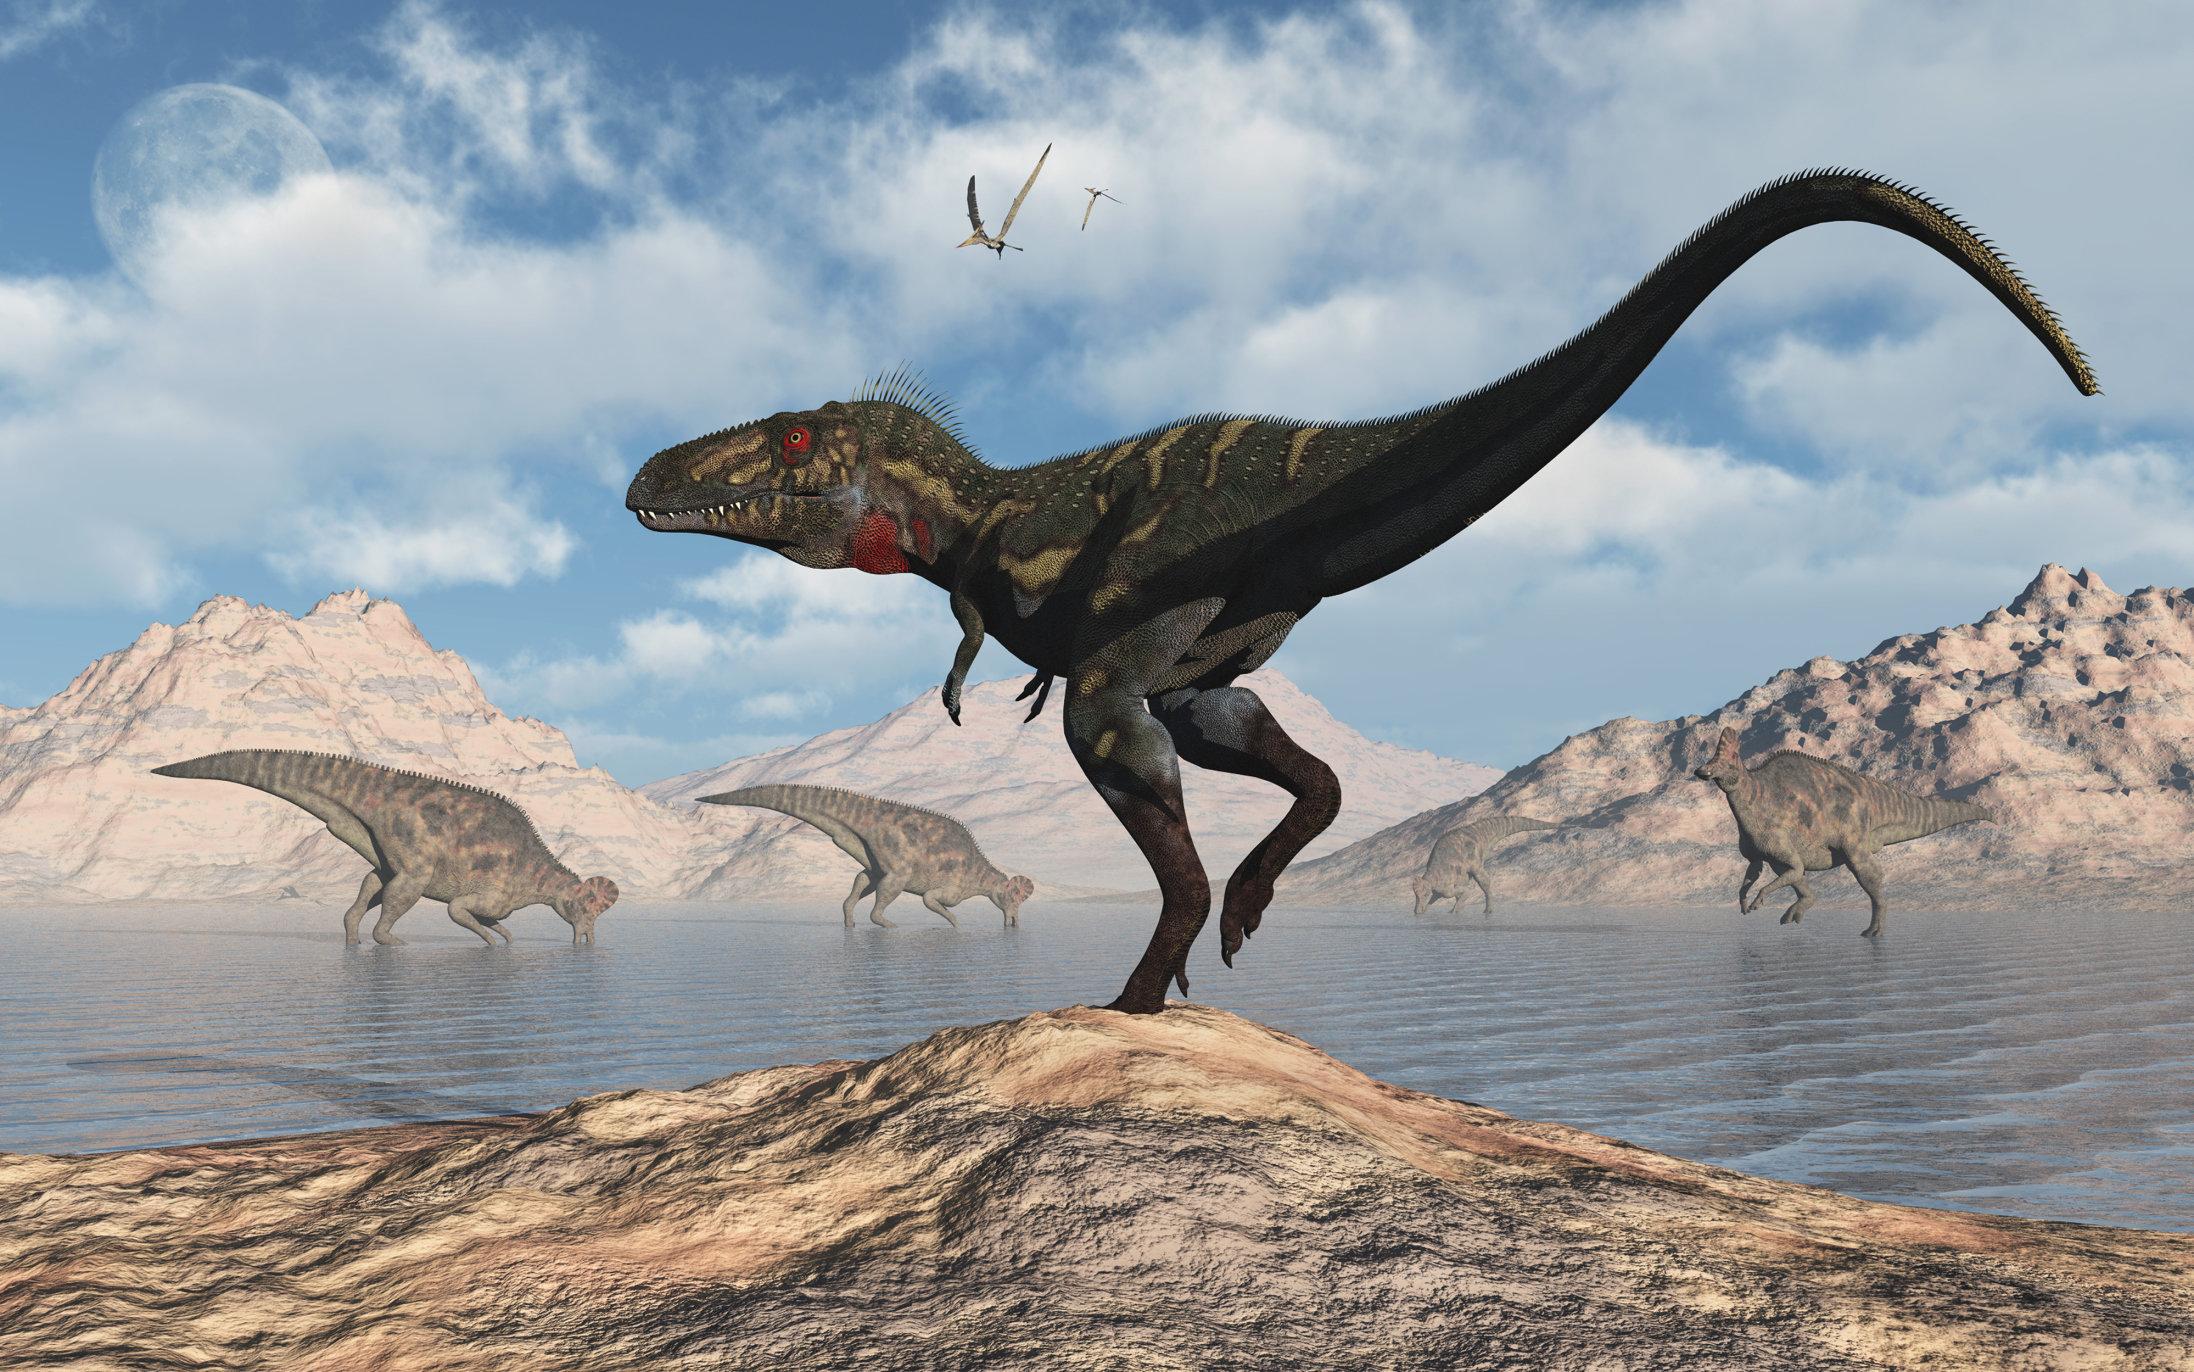 A carnivorous Nanotyrannus stalking a herd of Corythosaurus dinosaurs during Earths Cretaceous Period.